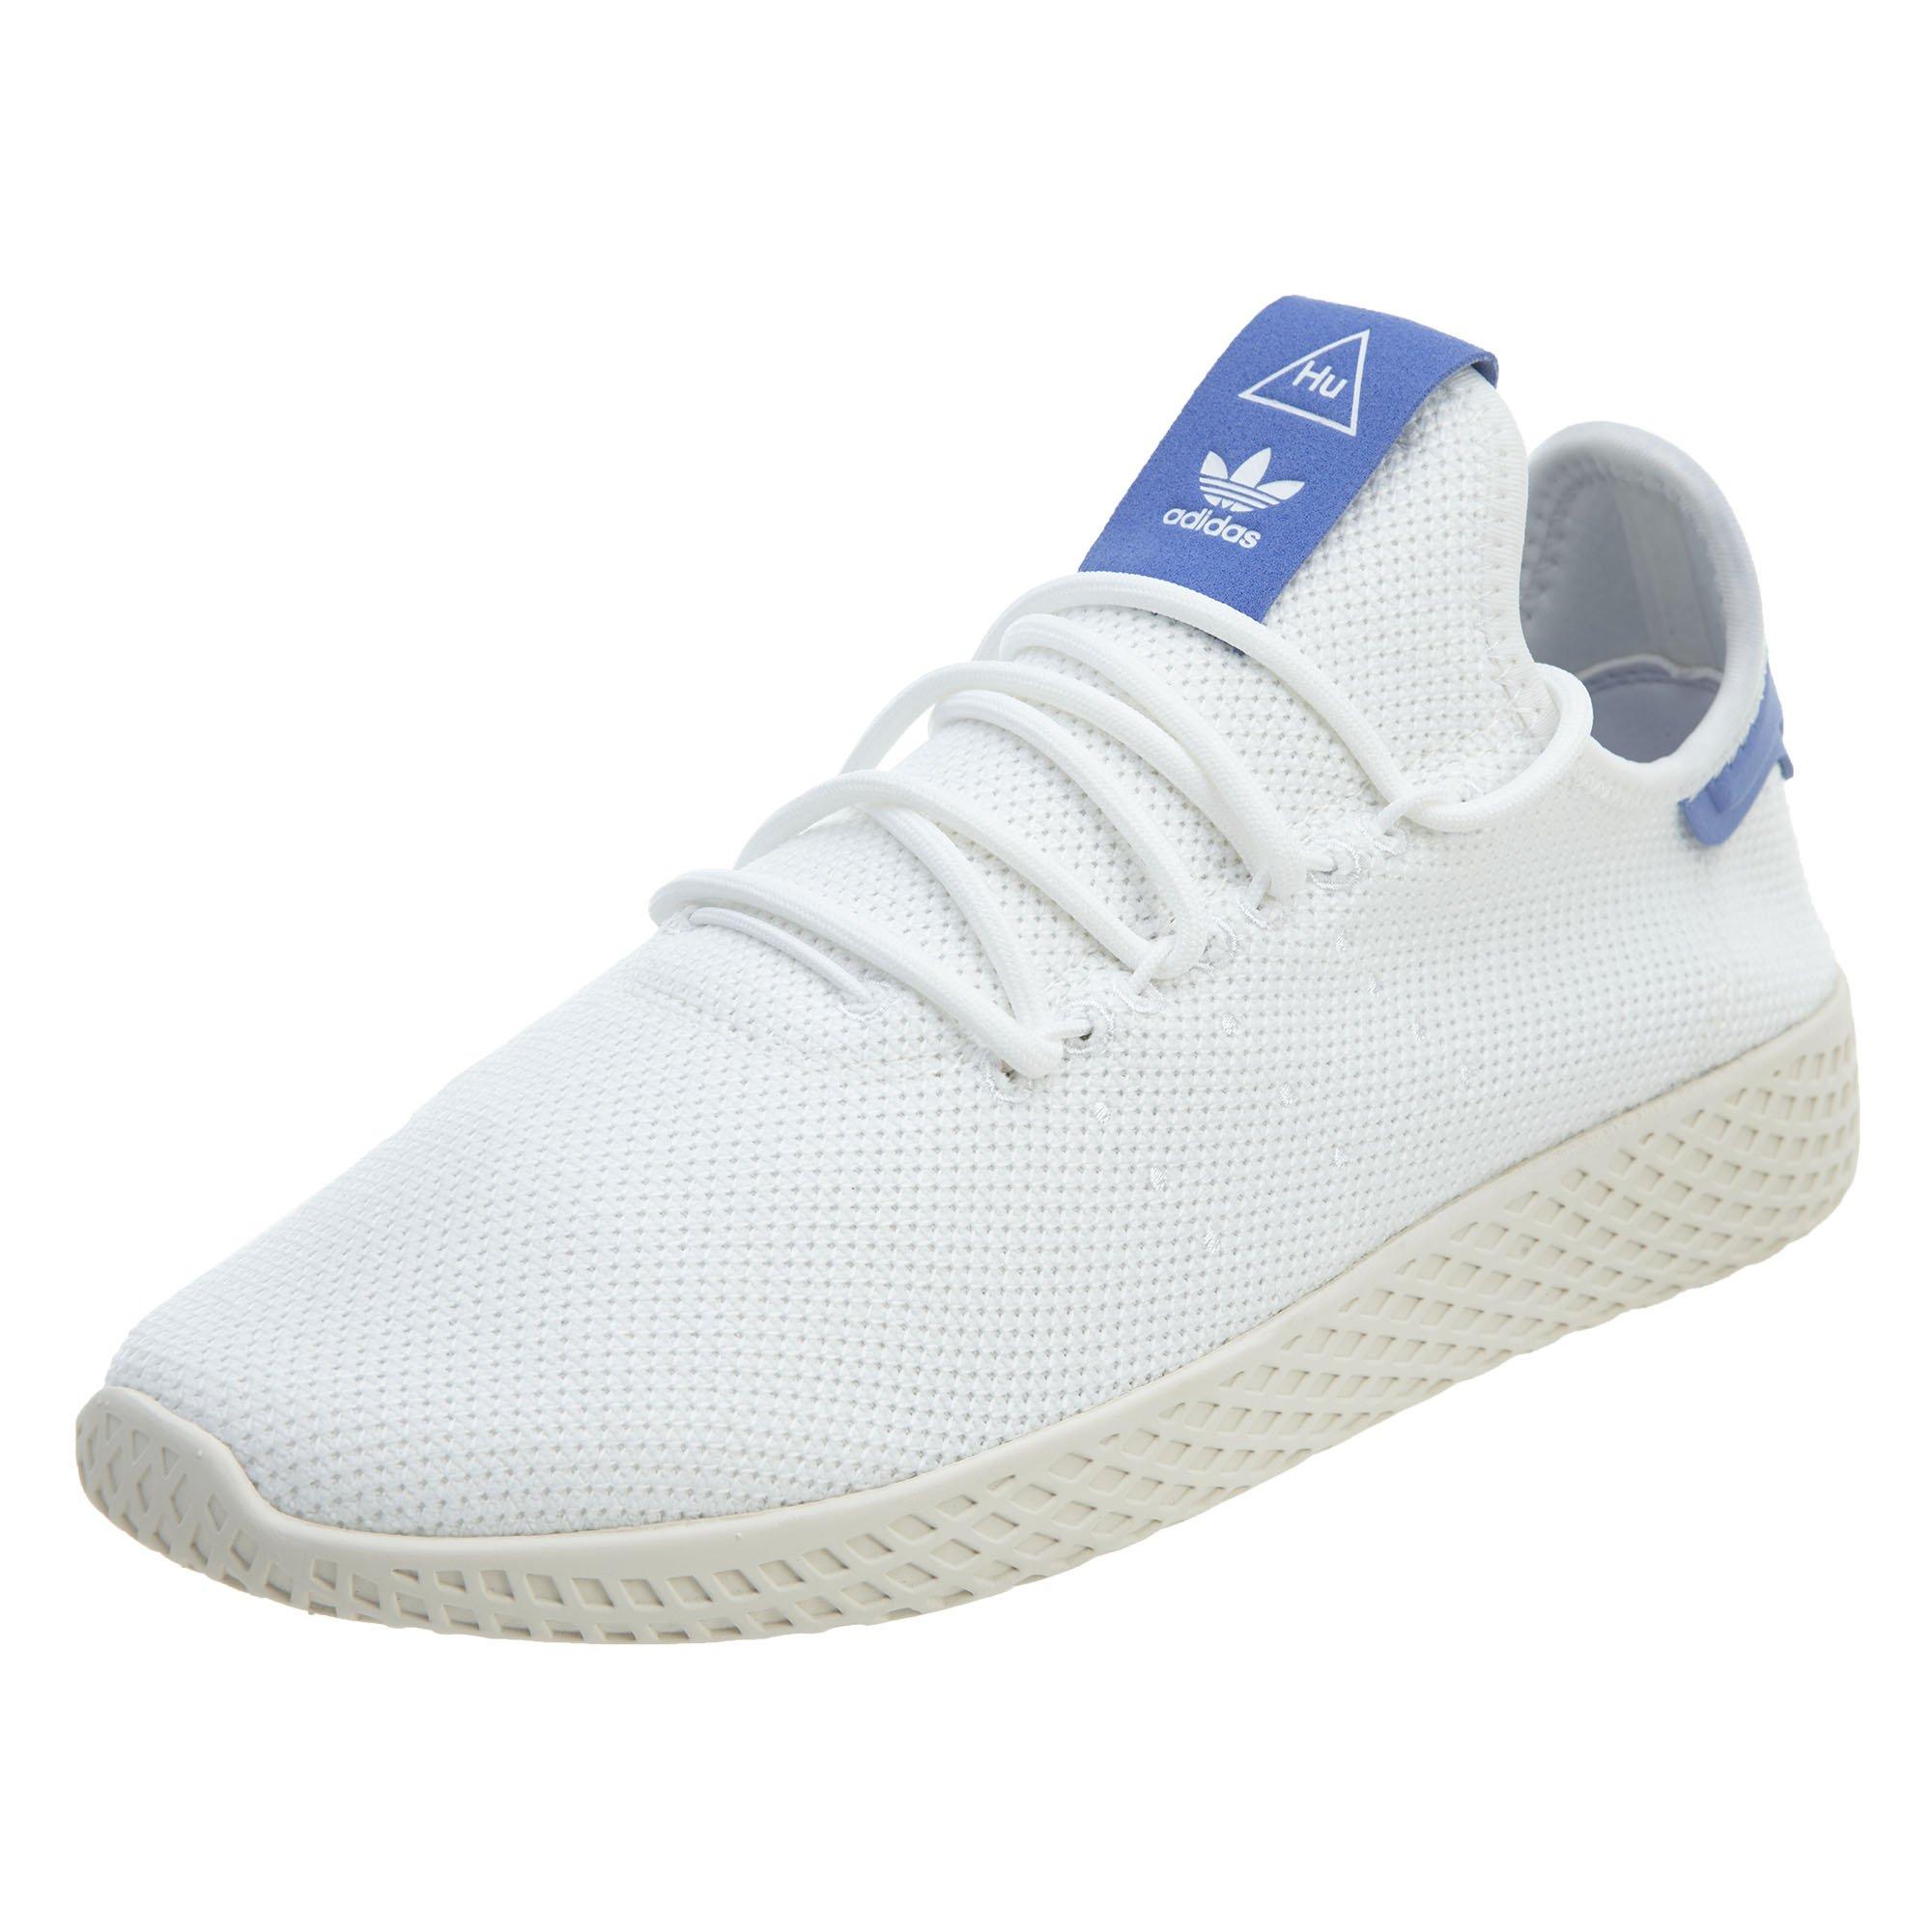 d4c0a8702c808 Galleon - Adidas Originals Men s Pw Tennis Hu Running Shoe